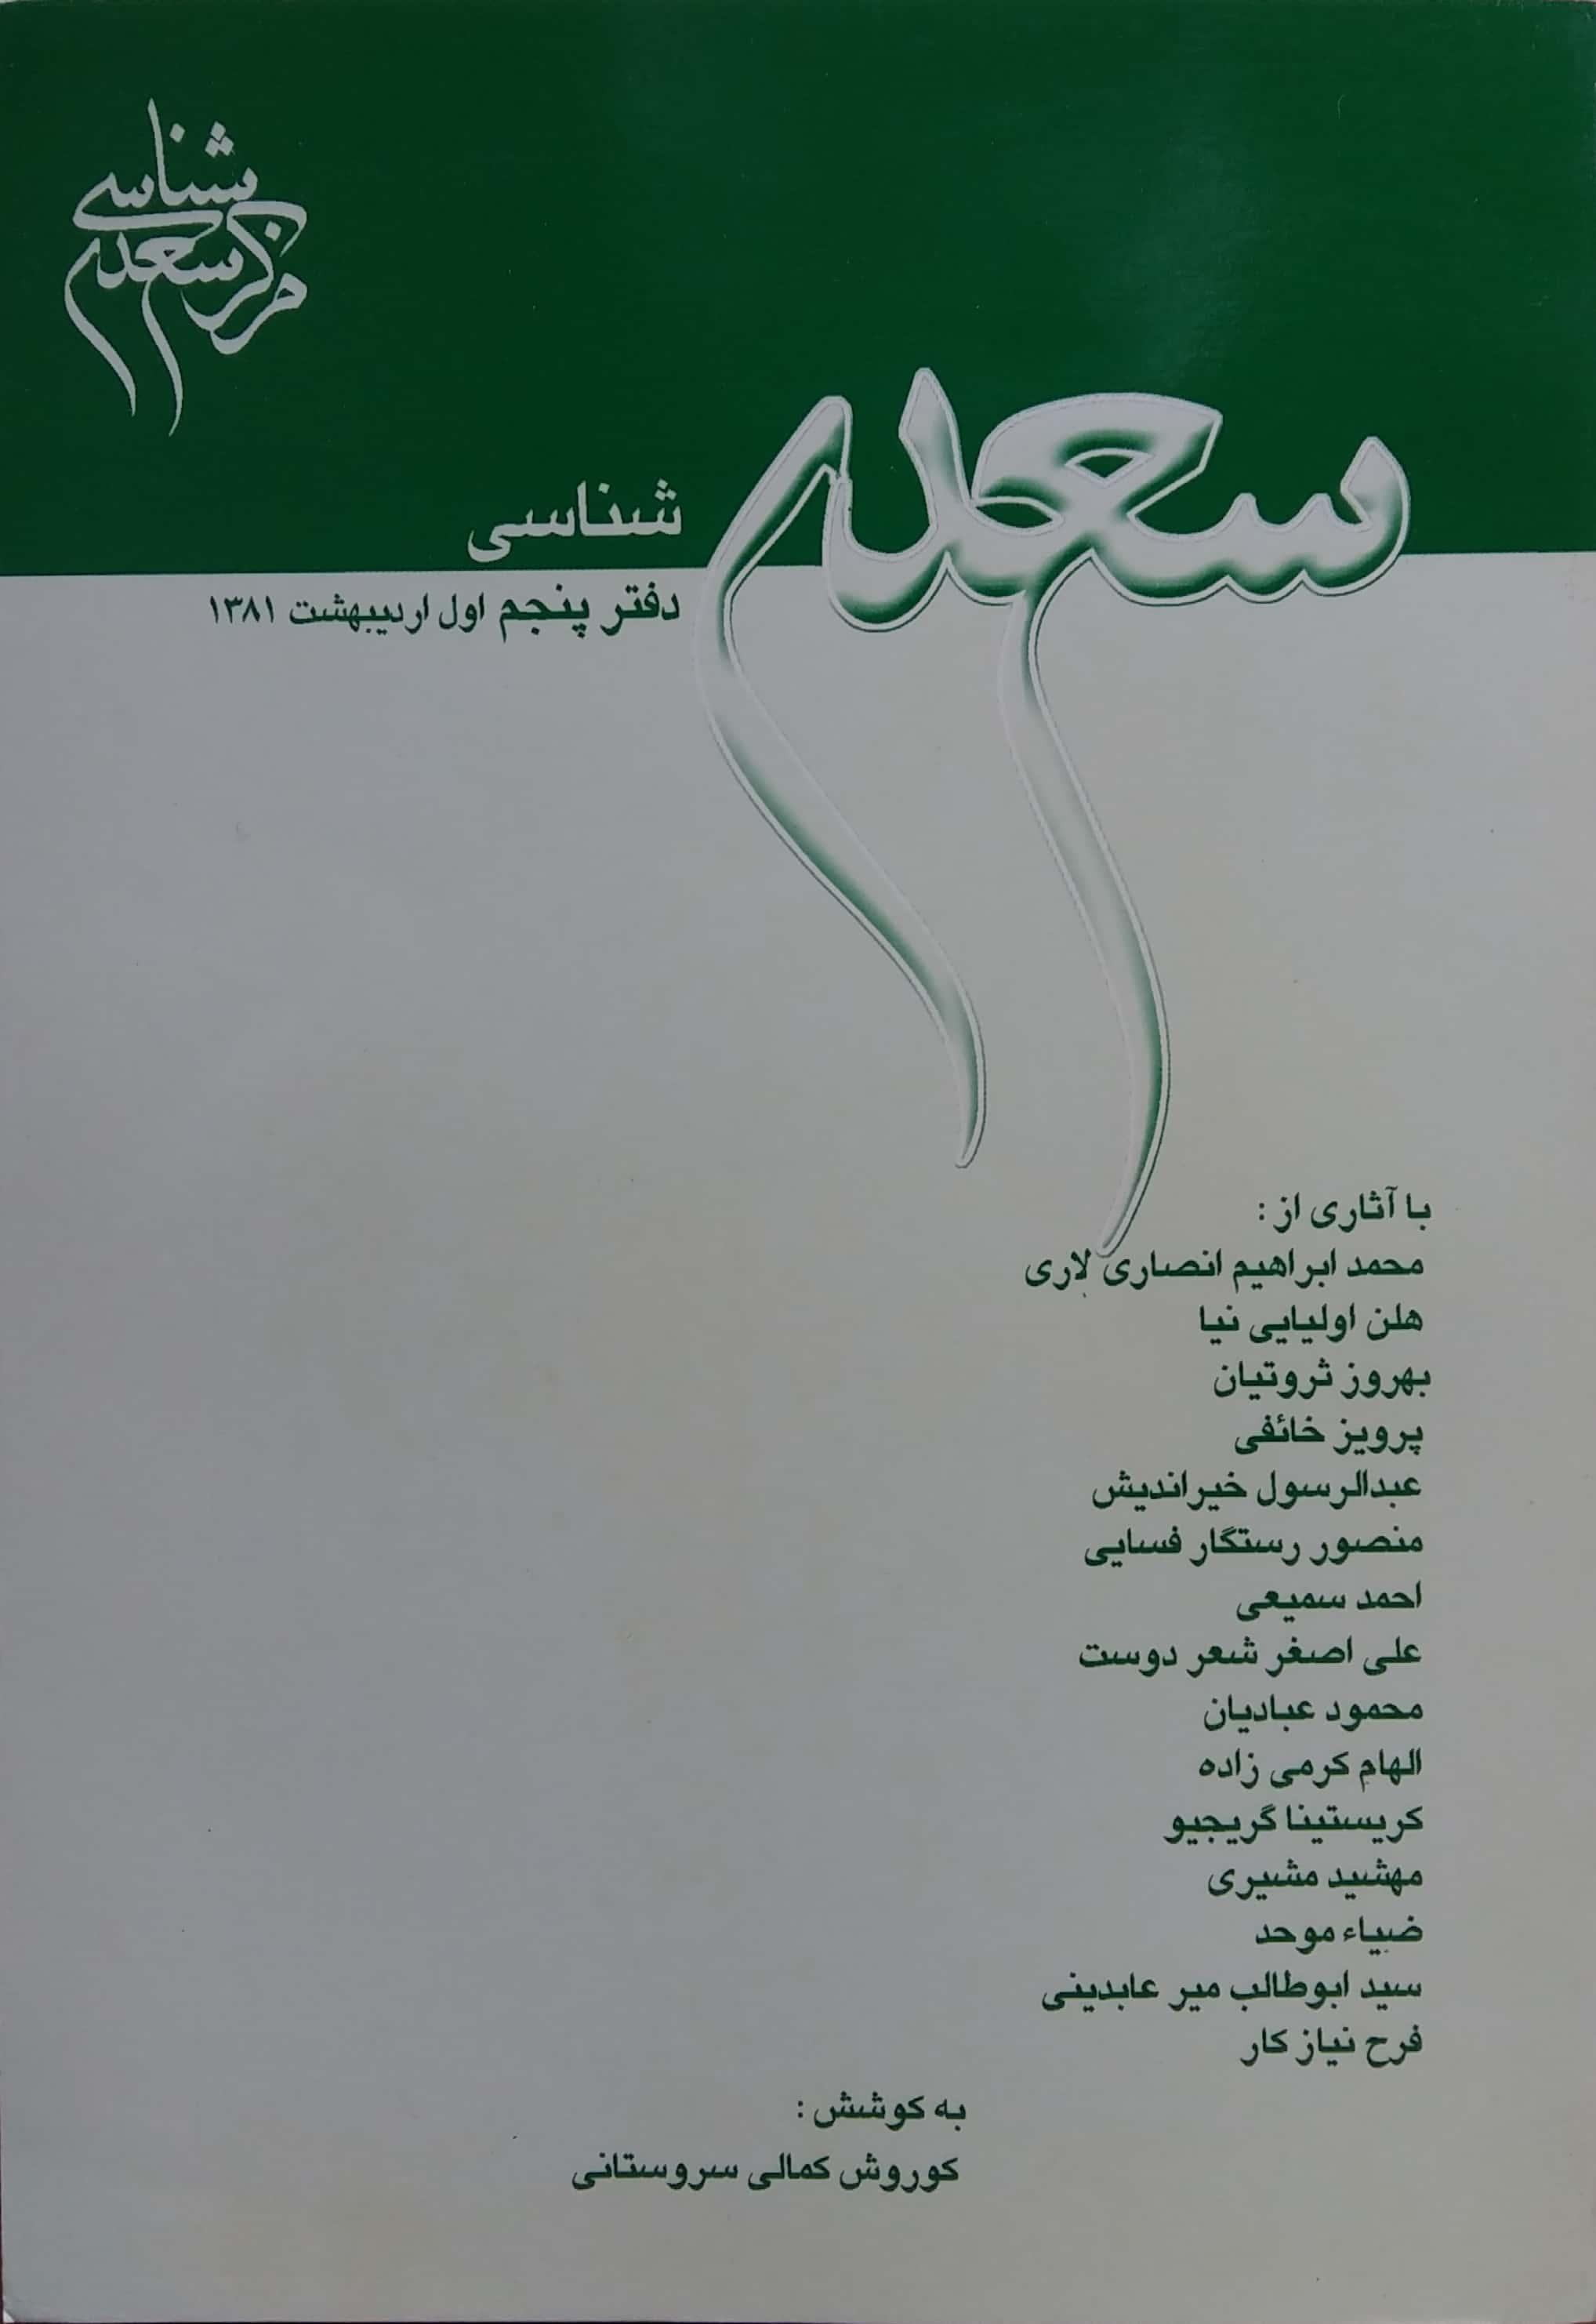 بنياد فارس شناسي سعدی شناسی دفتر پنجم (به کوشش کوروش کمالی سروستانی)